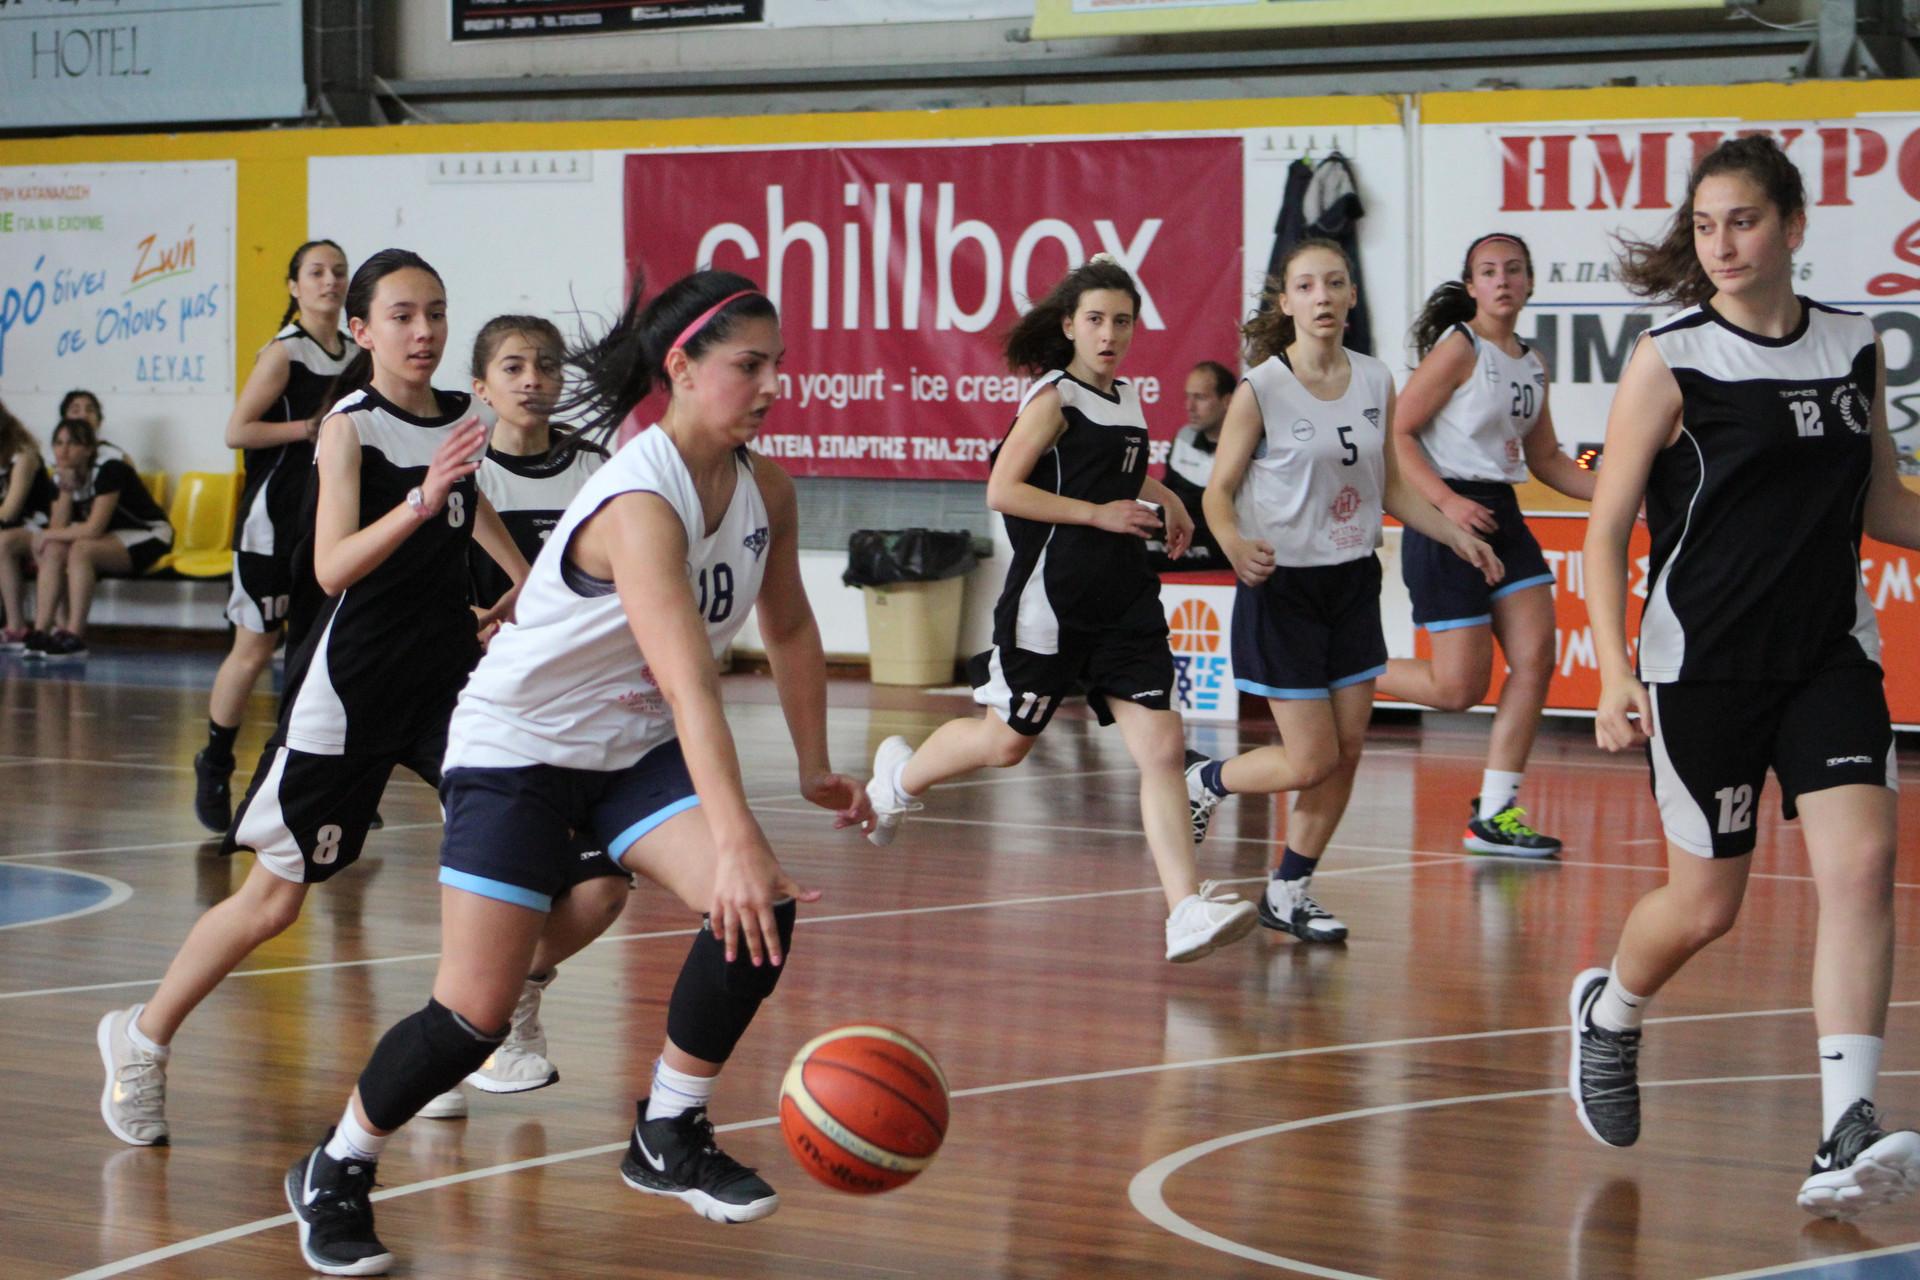 super-league-athletic-academy-athens-tour-2019-day-1_46762659215_o